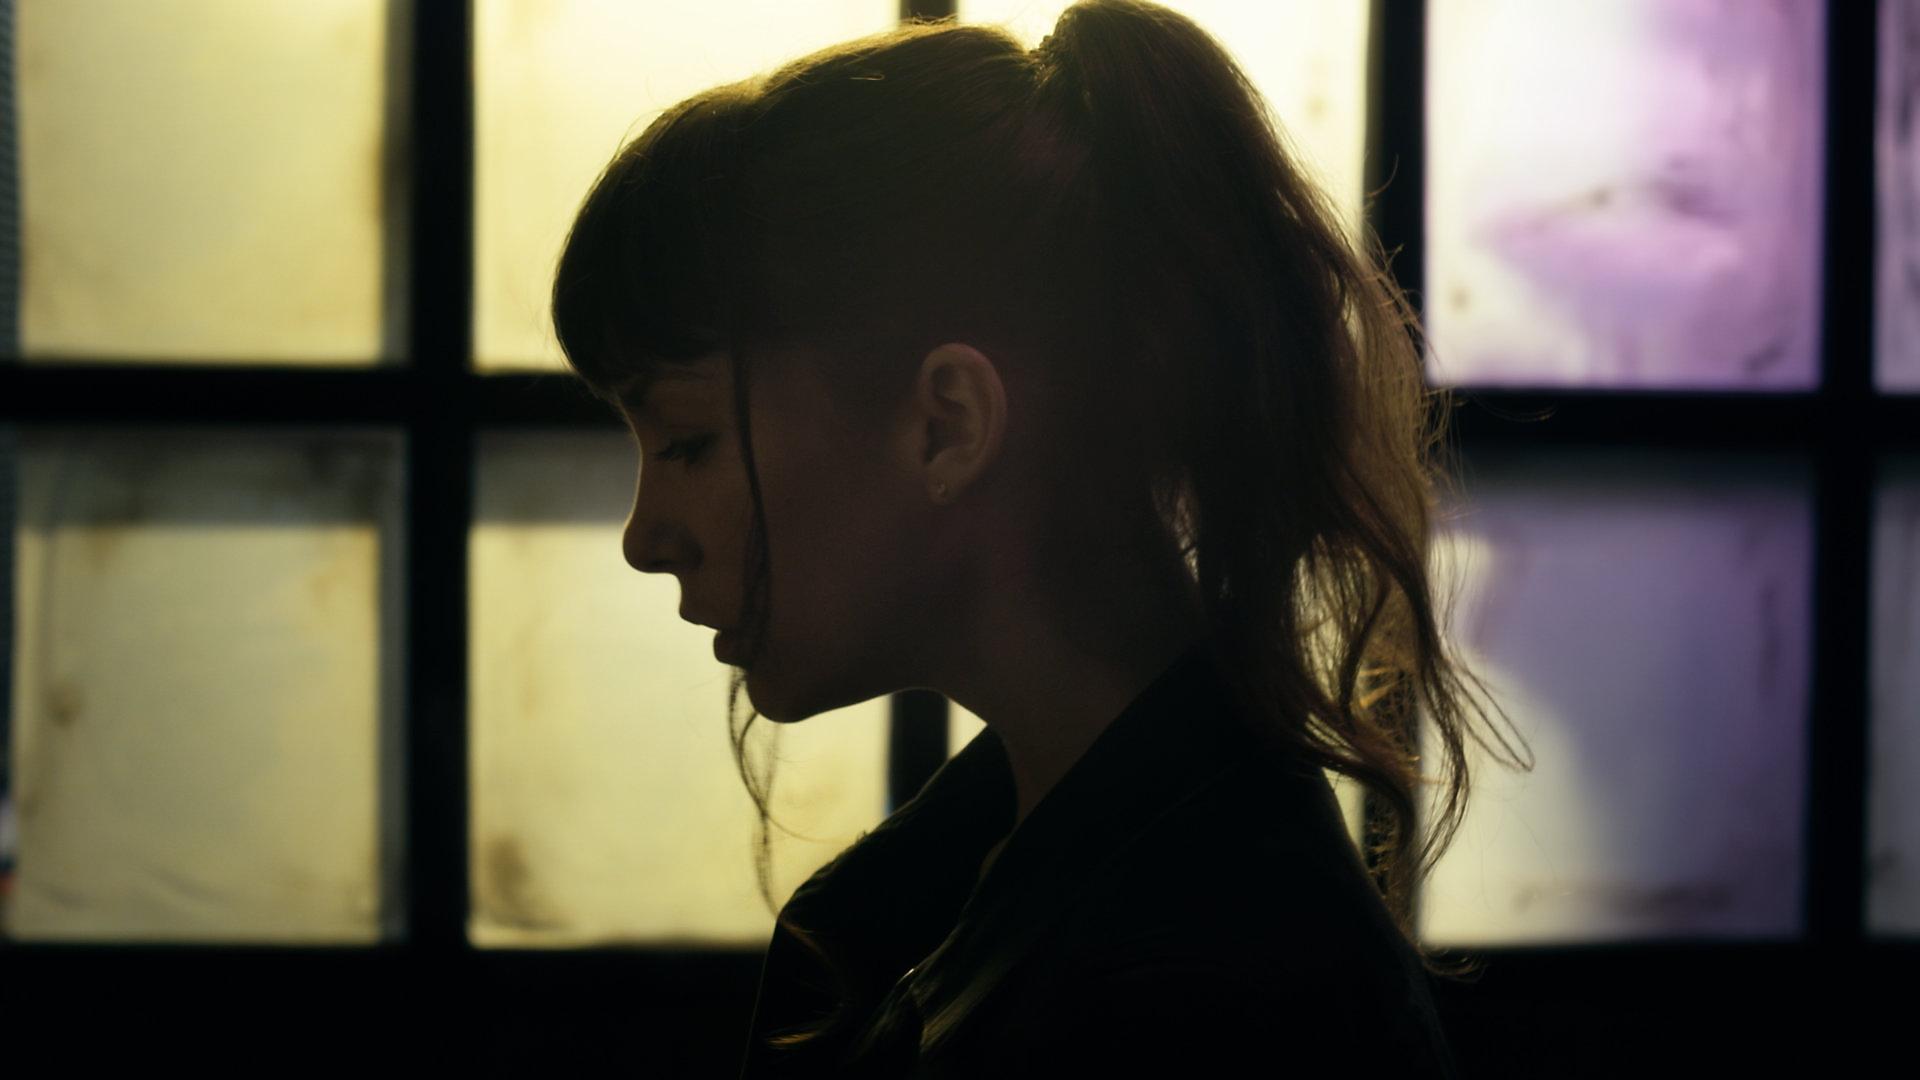 Erica-skjermbilde 7